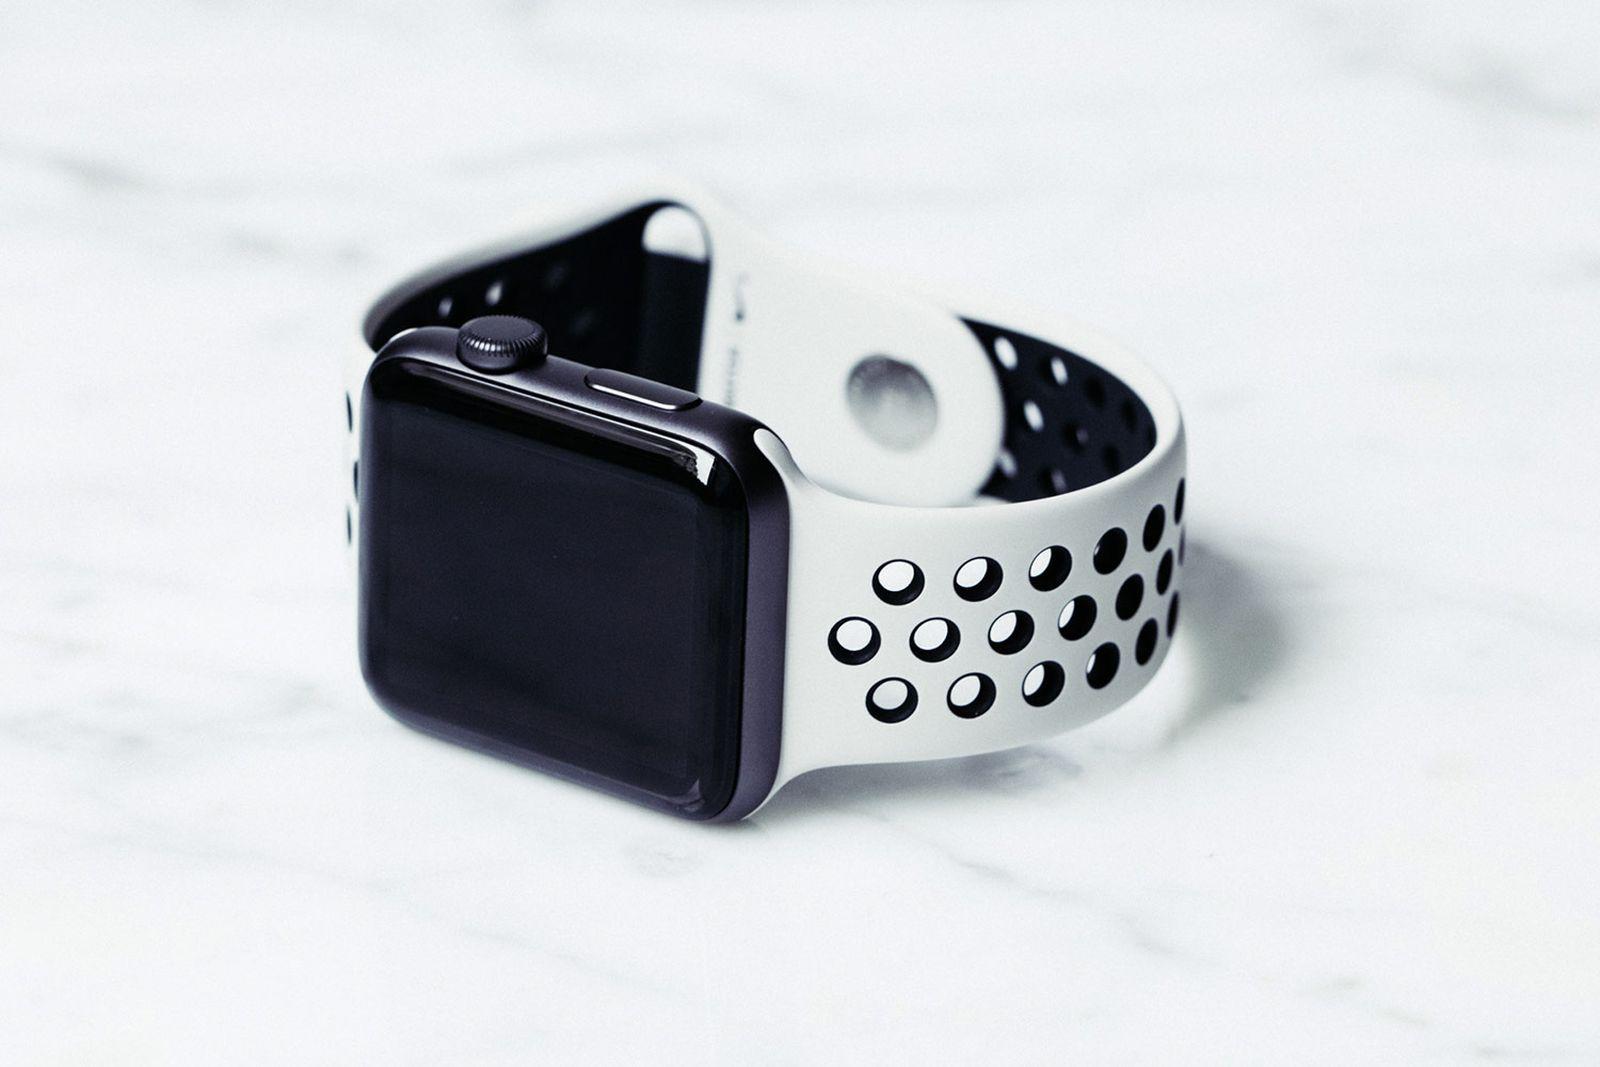 Nike-Lab-Apple-Watch-02